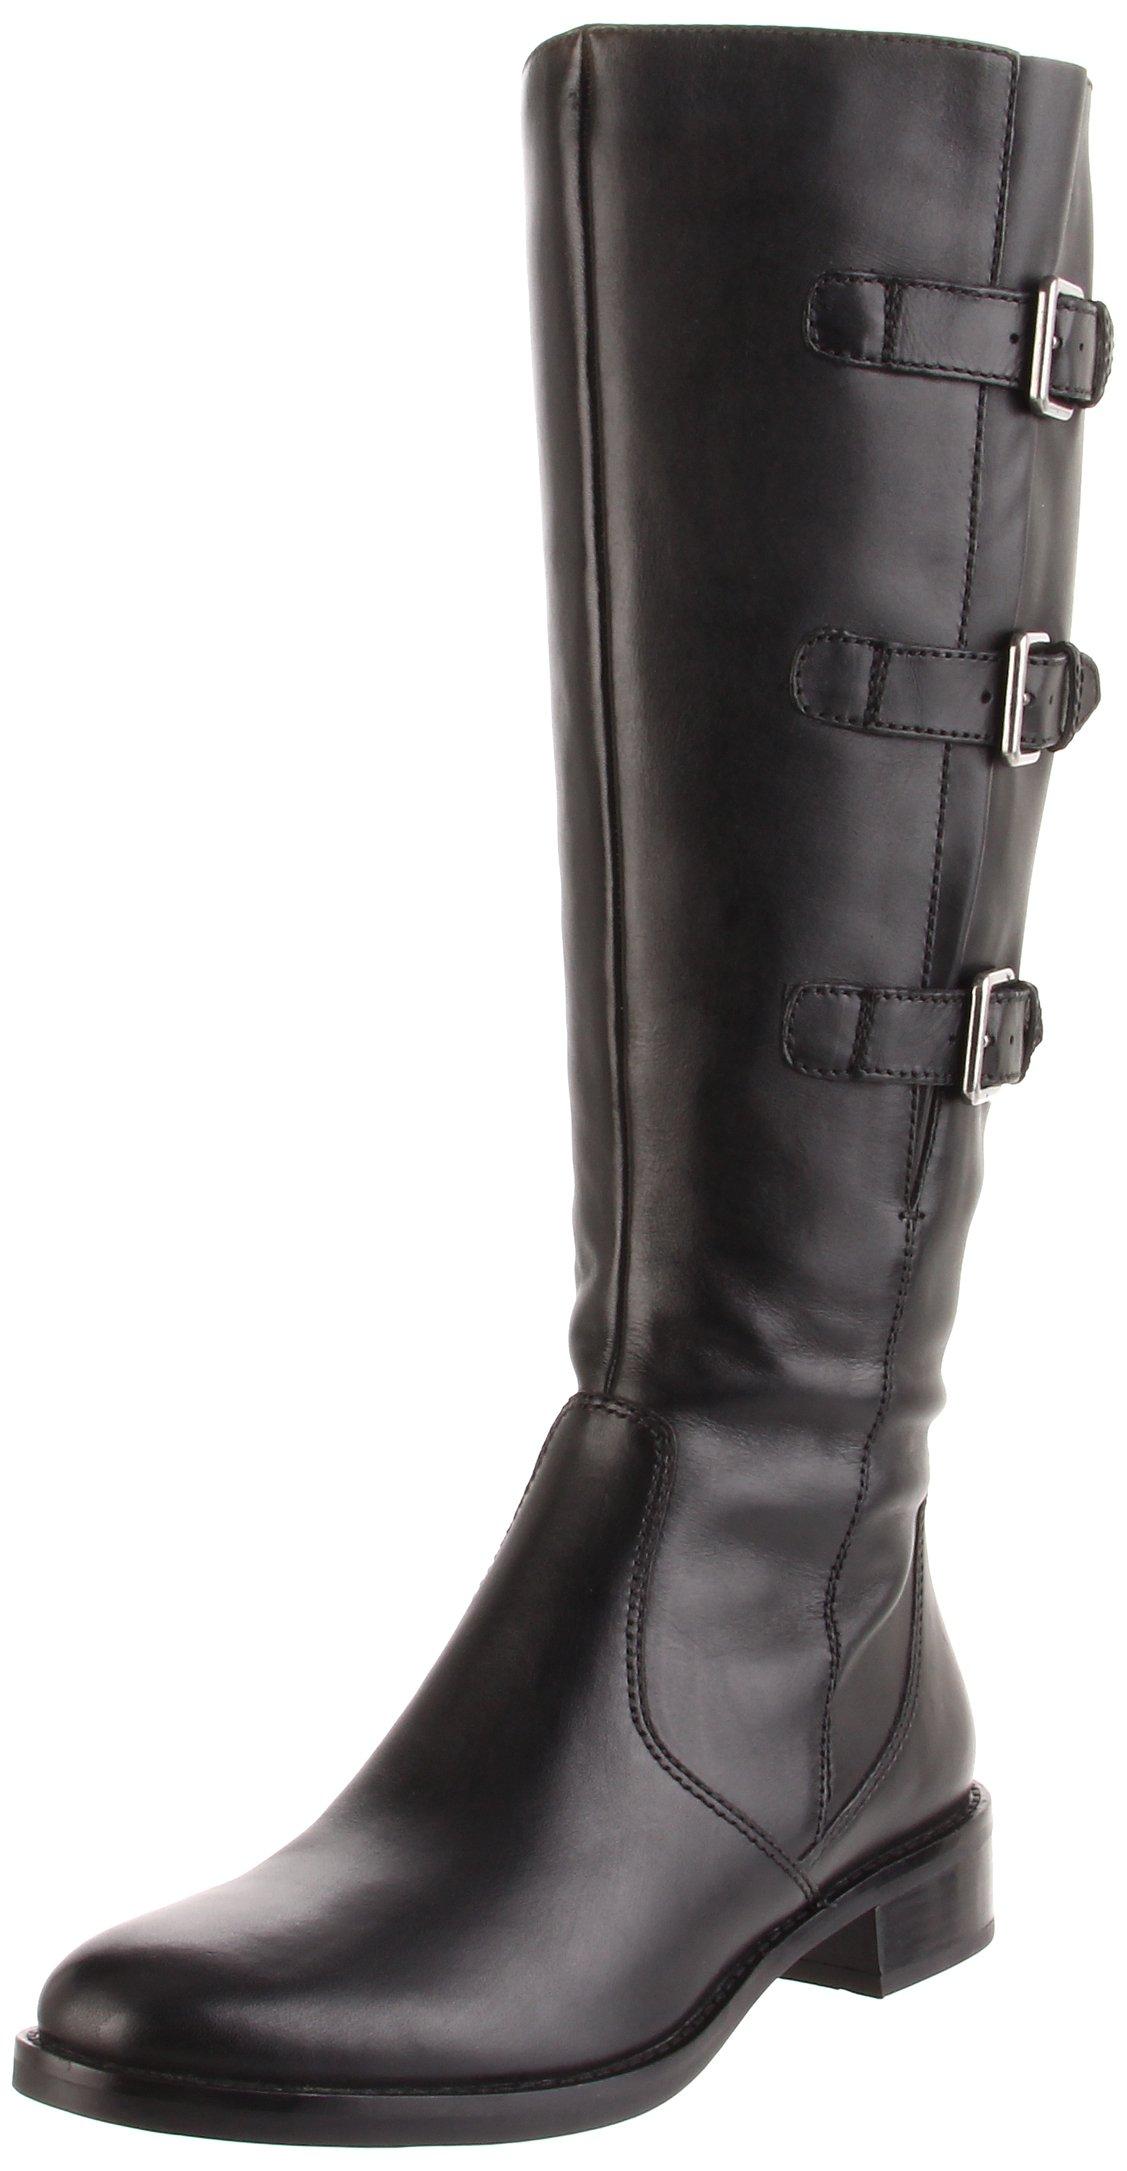 ECCO Women's Hobart Buckle Boot,Black,39 EU (US Women's 8-8.5 M)